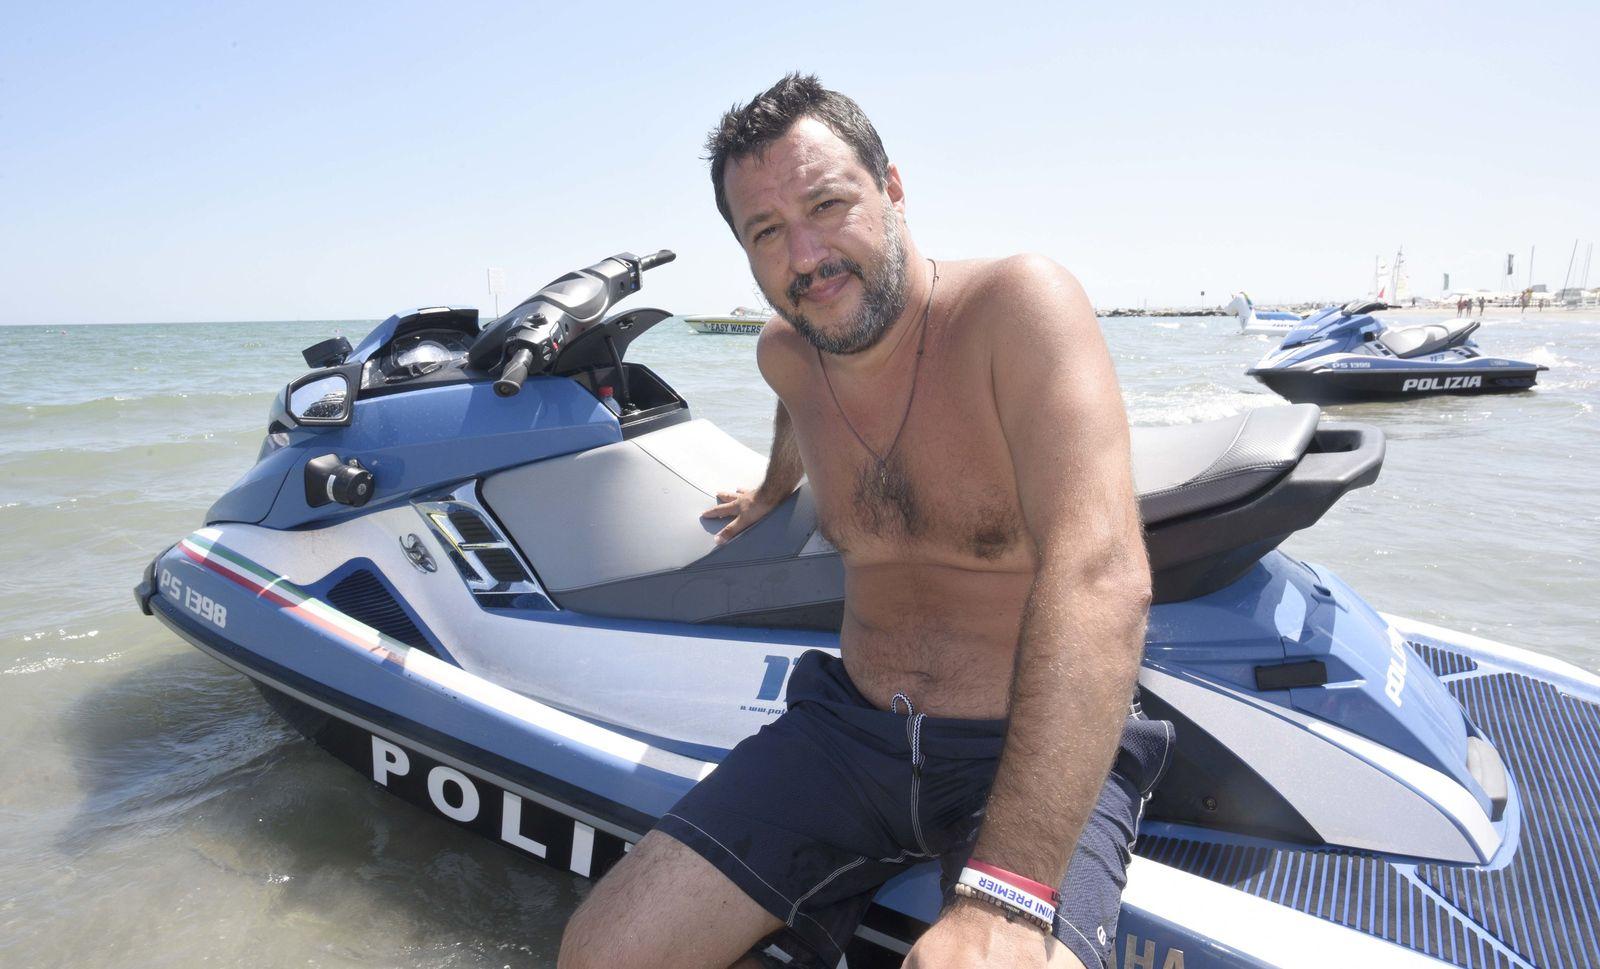 Salvini im Urlaub